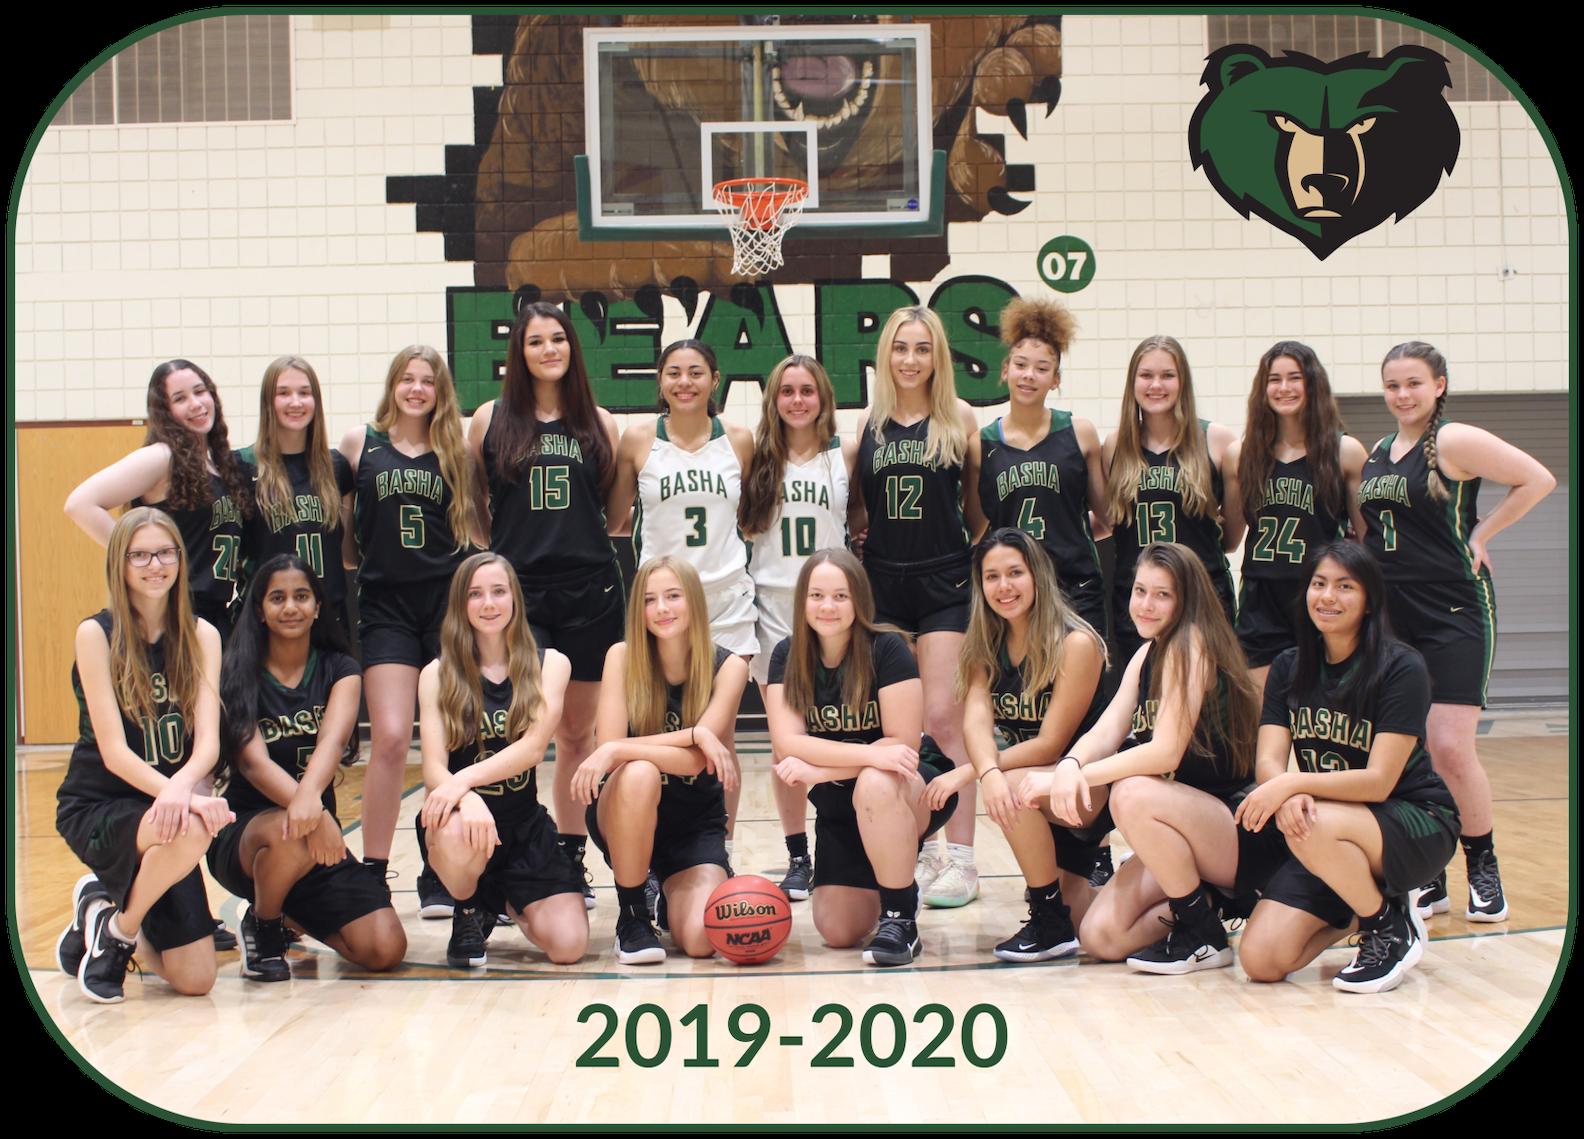 2019 - 2020 Basha Girls Basketball - Support Your Bears!